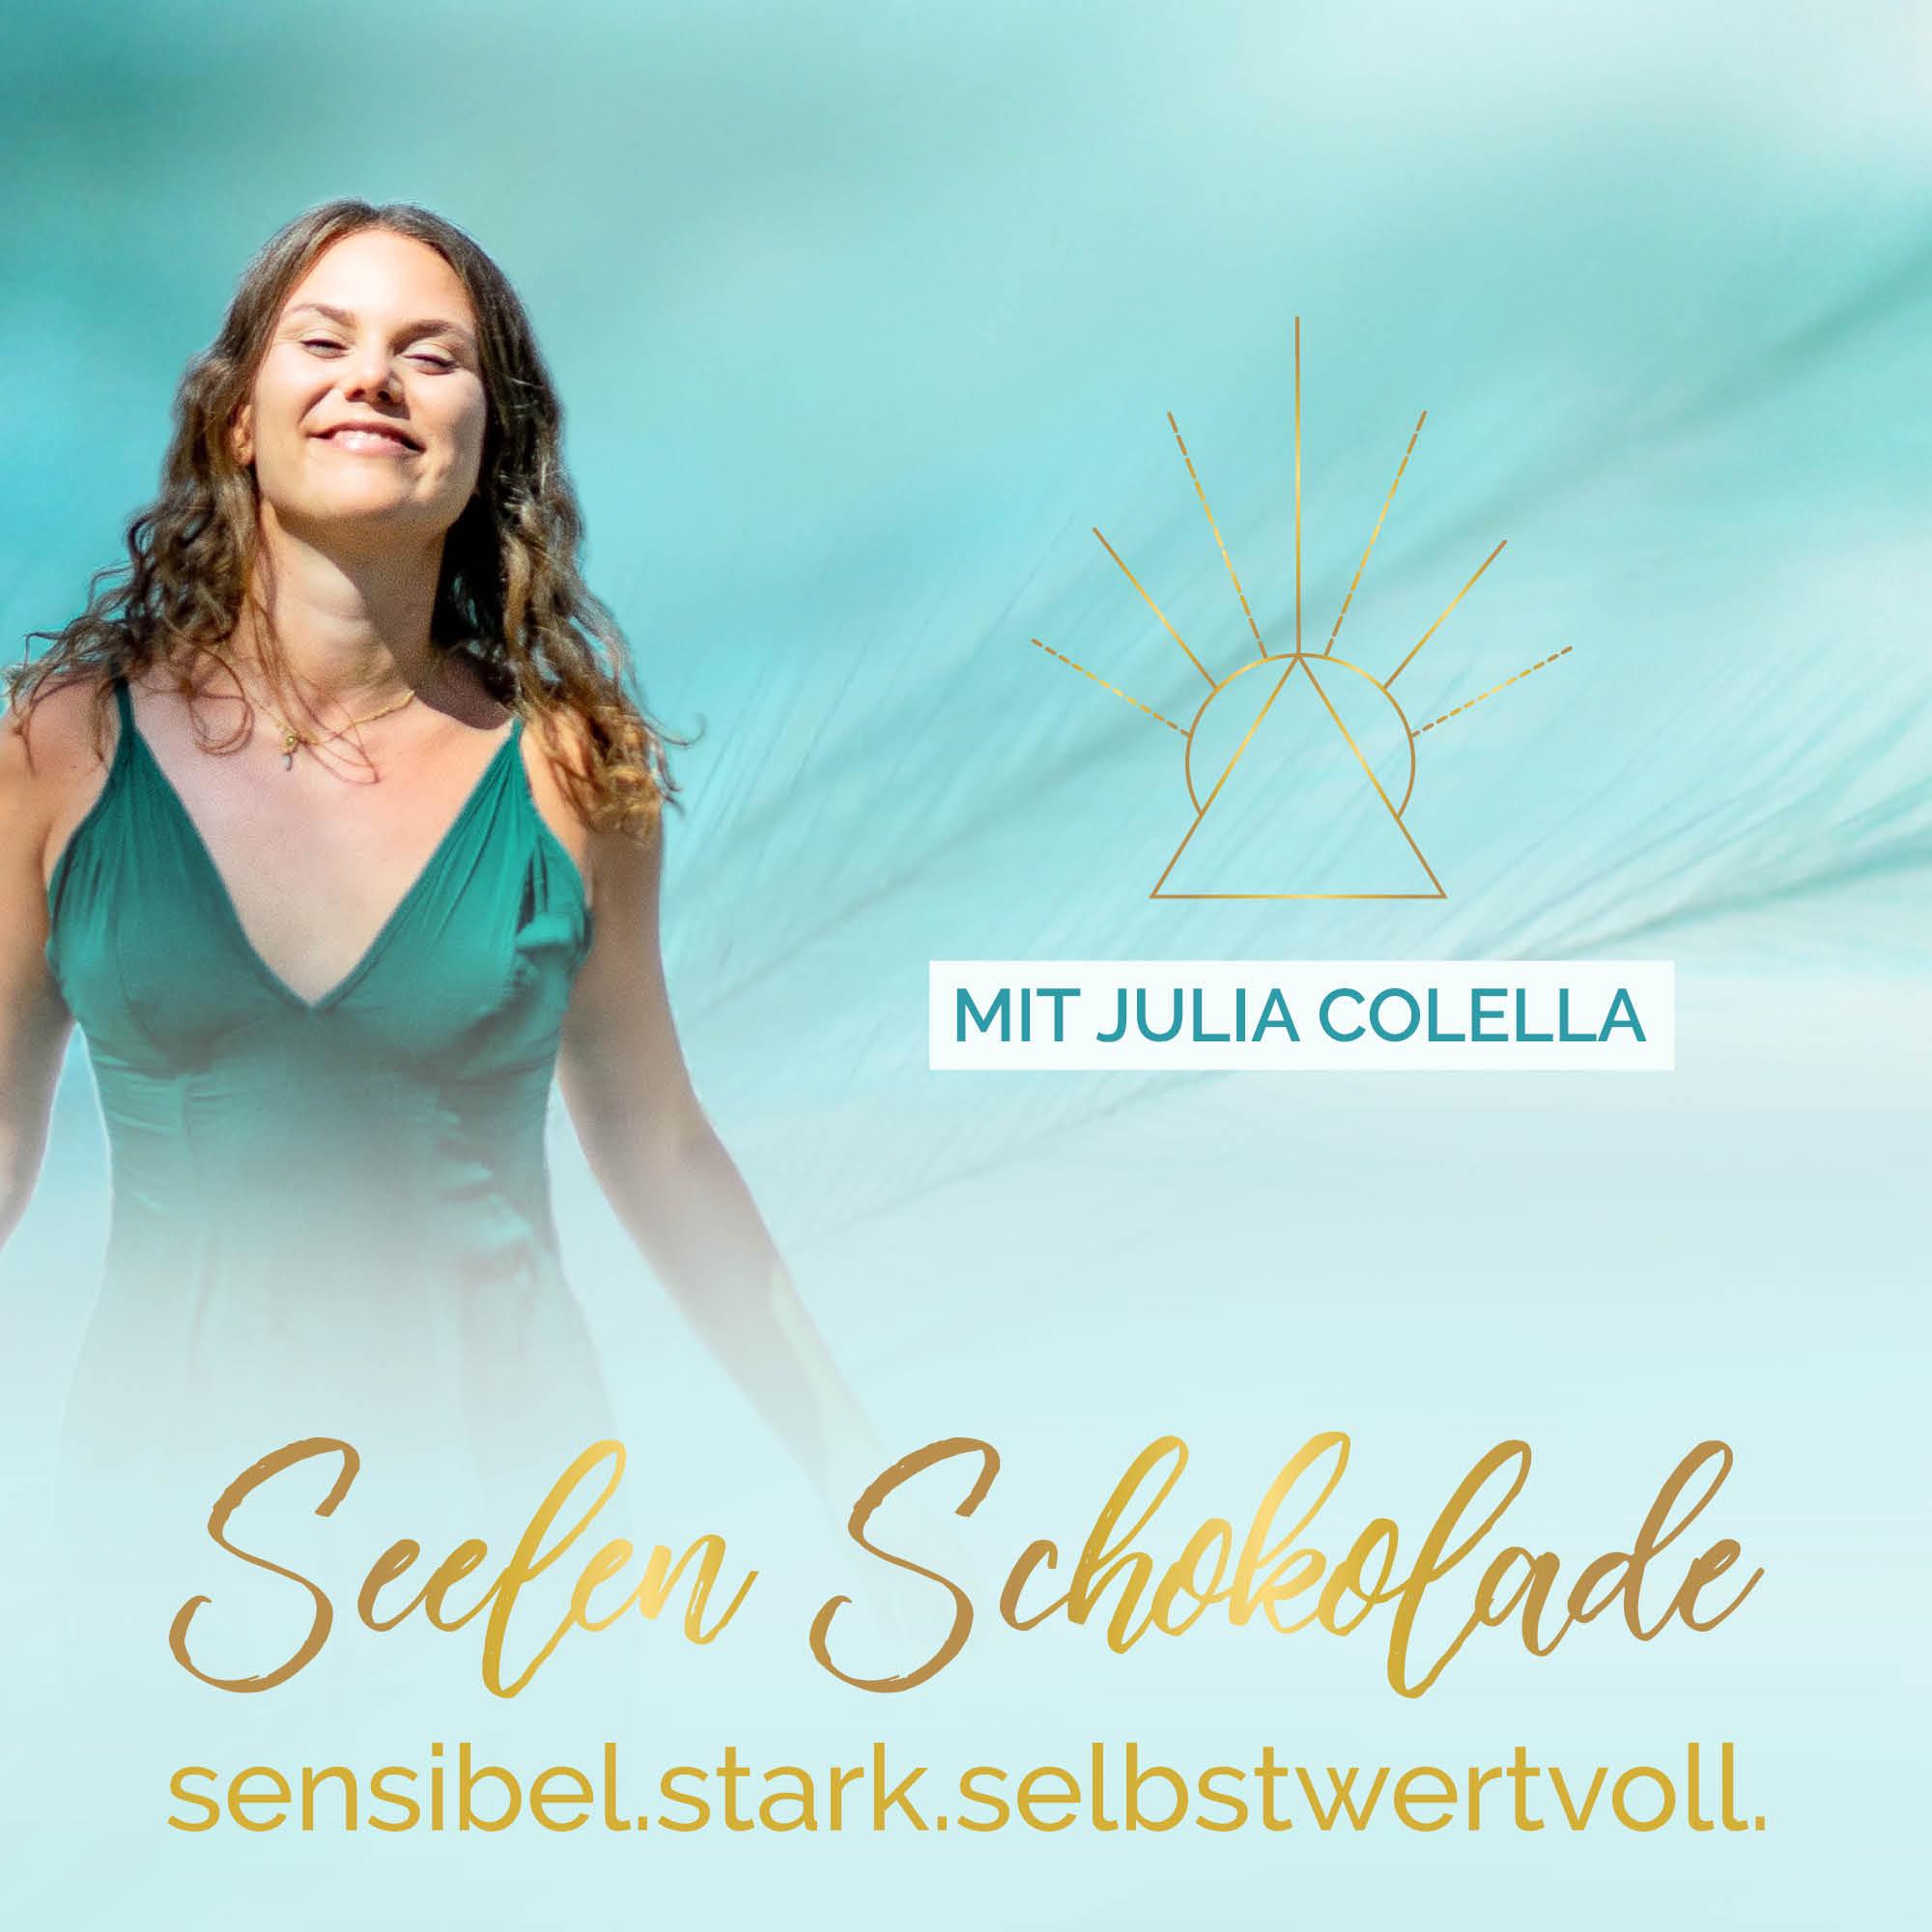 Seelenschokolade mit Julia Colella   Sensibel, Stark & Selbstbewusst